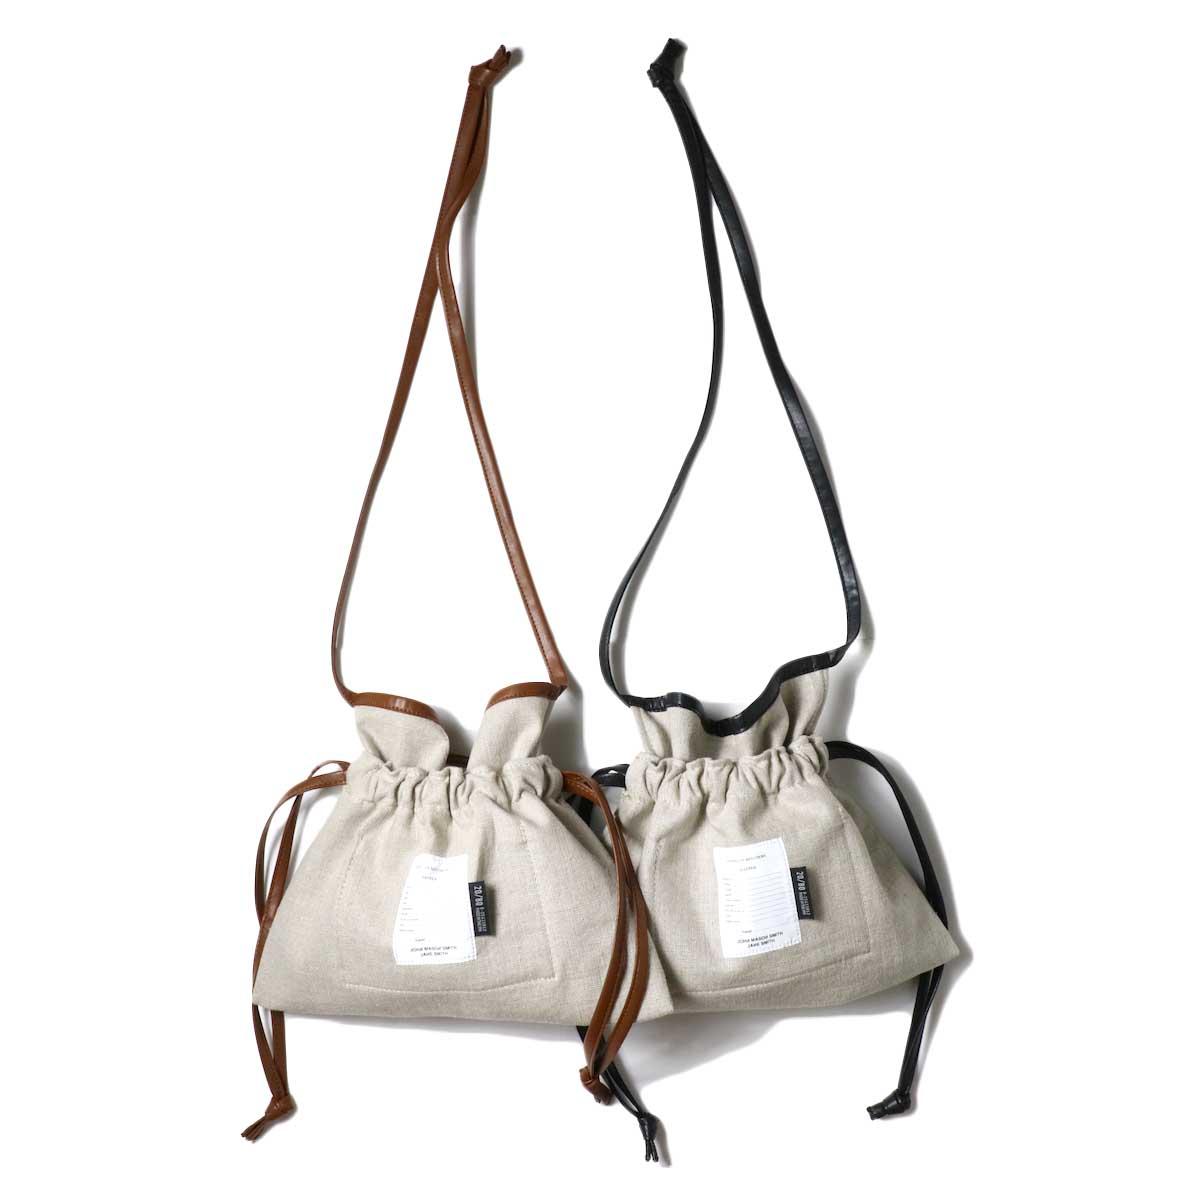 JANE SMITH / Redcross Bag